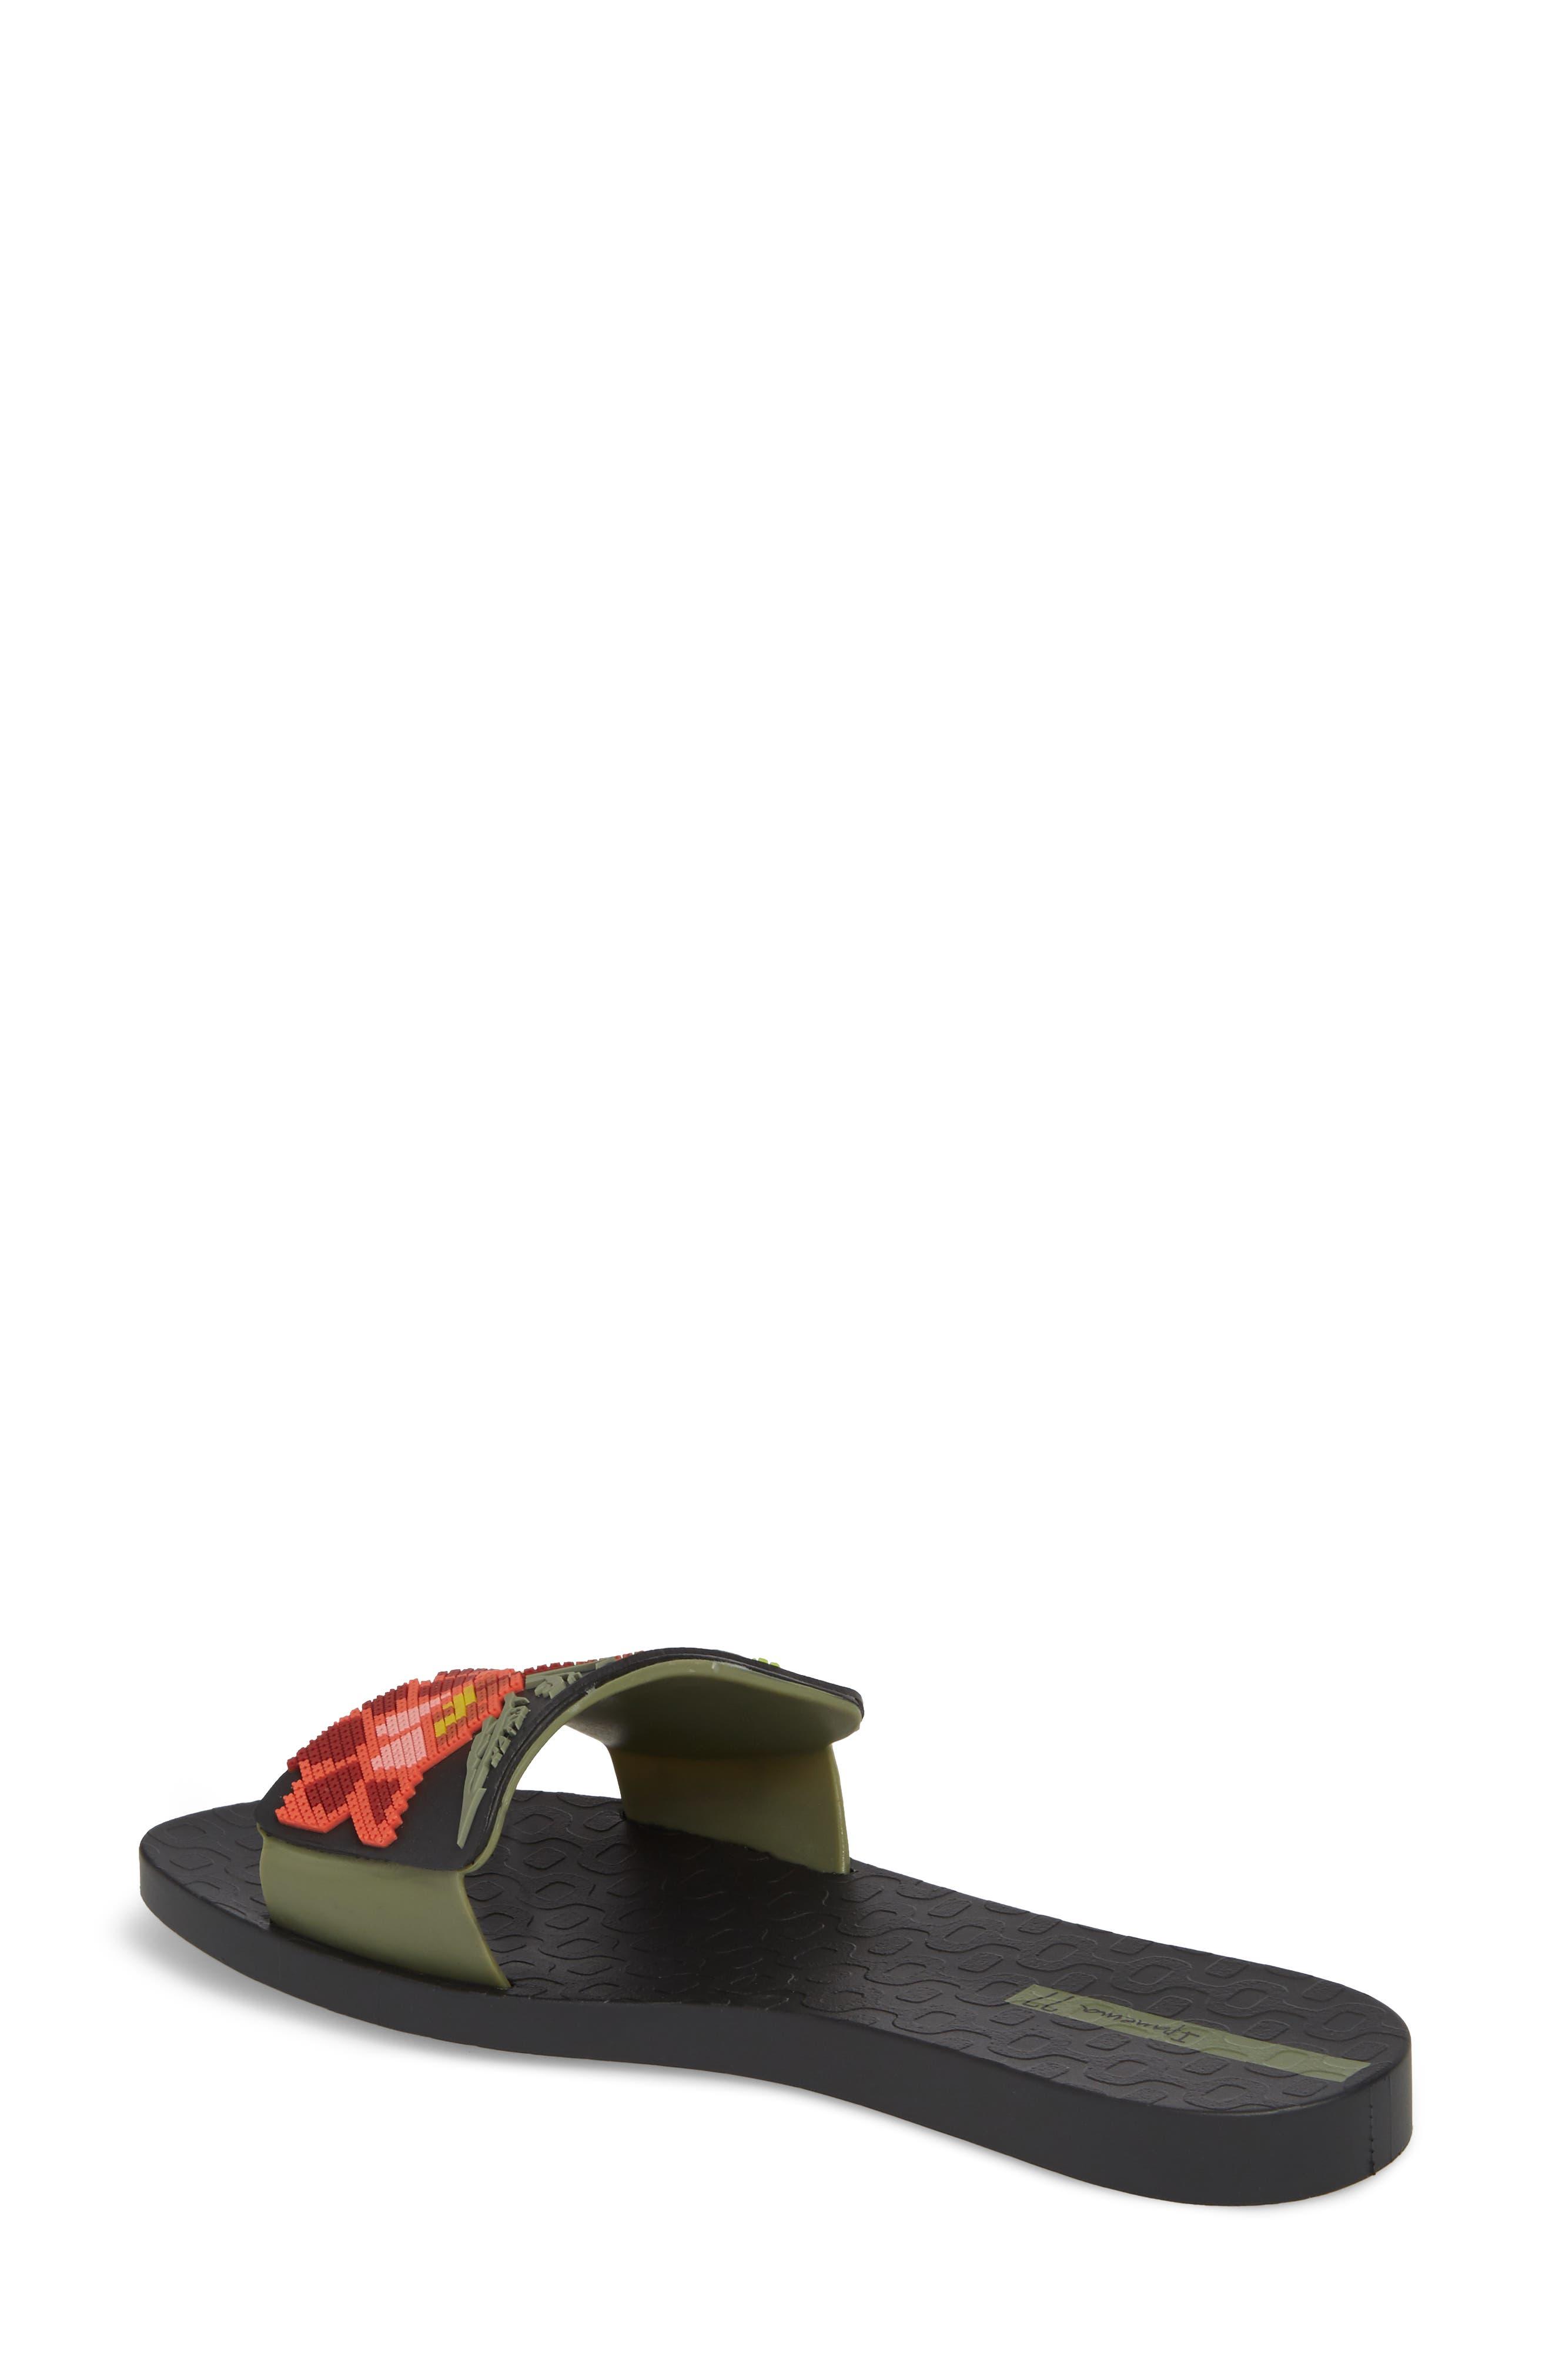 IPANEMA, Nectar Floral Slide Sandal, Alternate thumbnail 2, color, BLACK/ GREEN